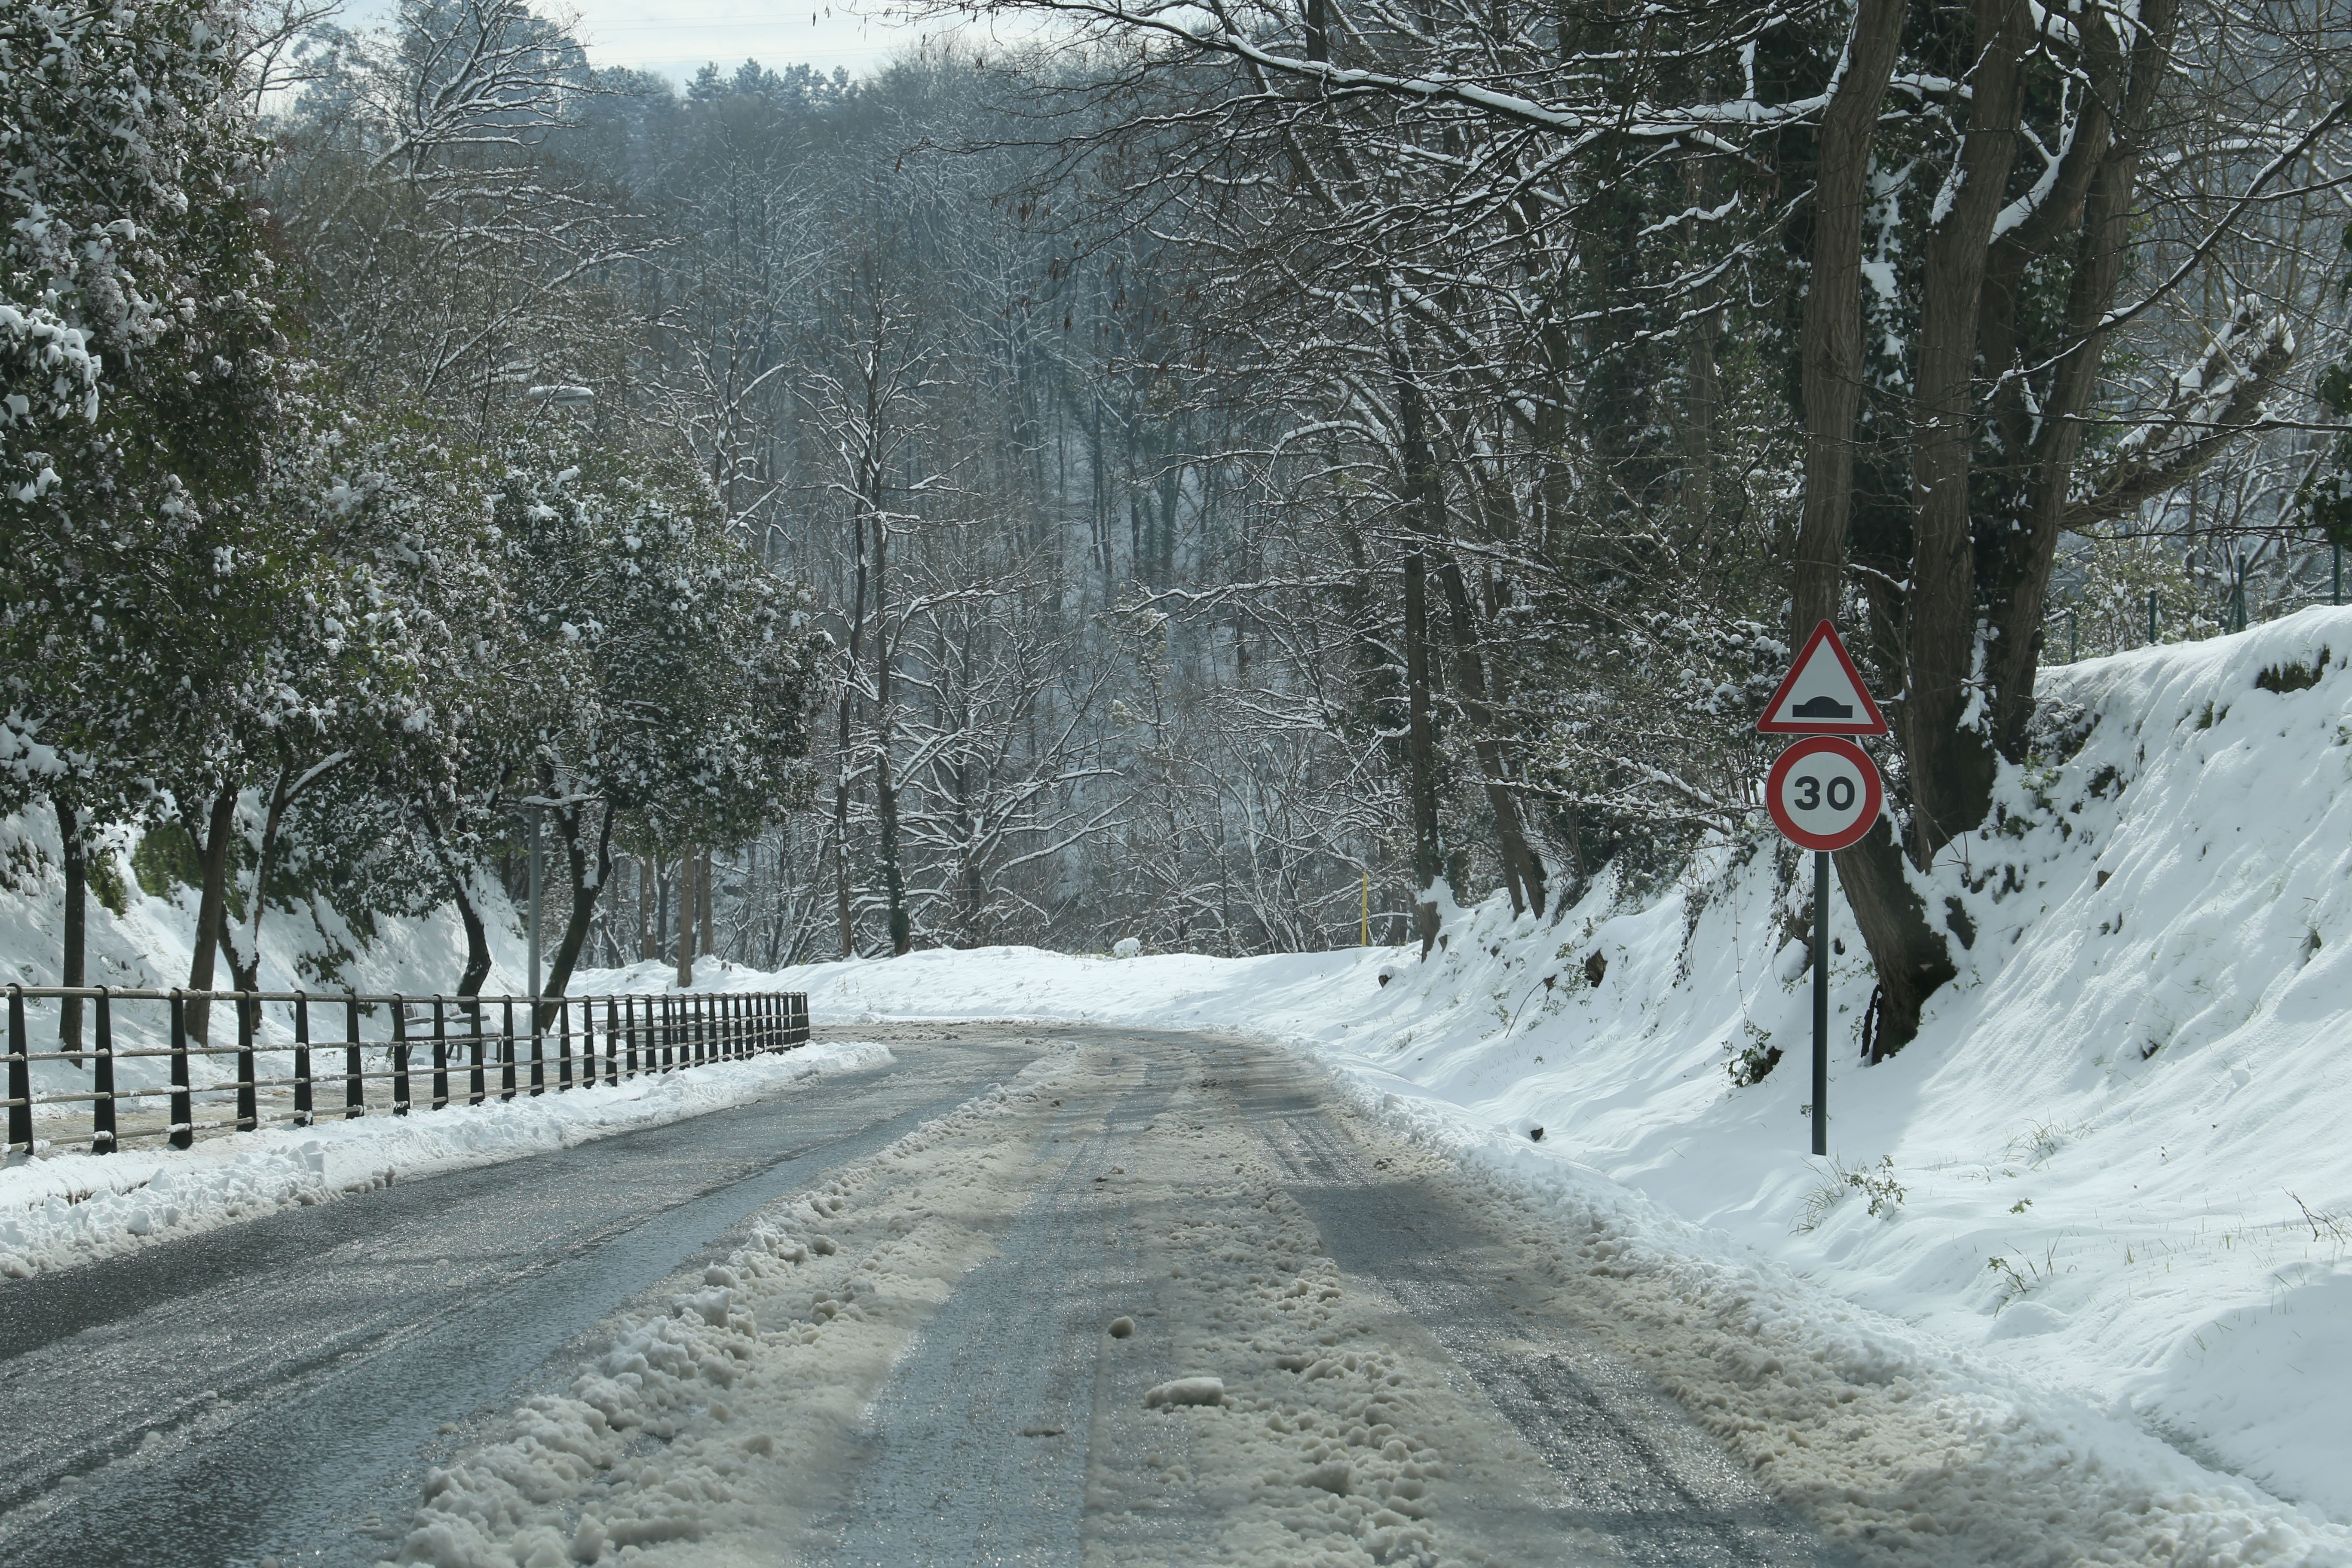 Trafico-nieve21.JPG